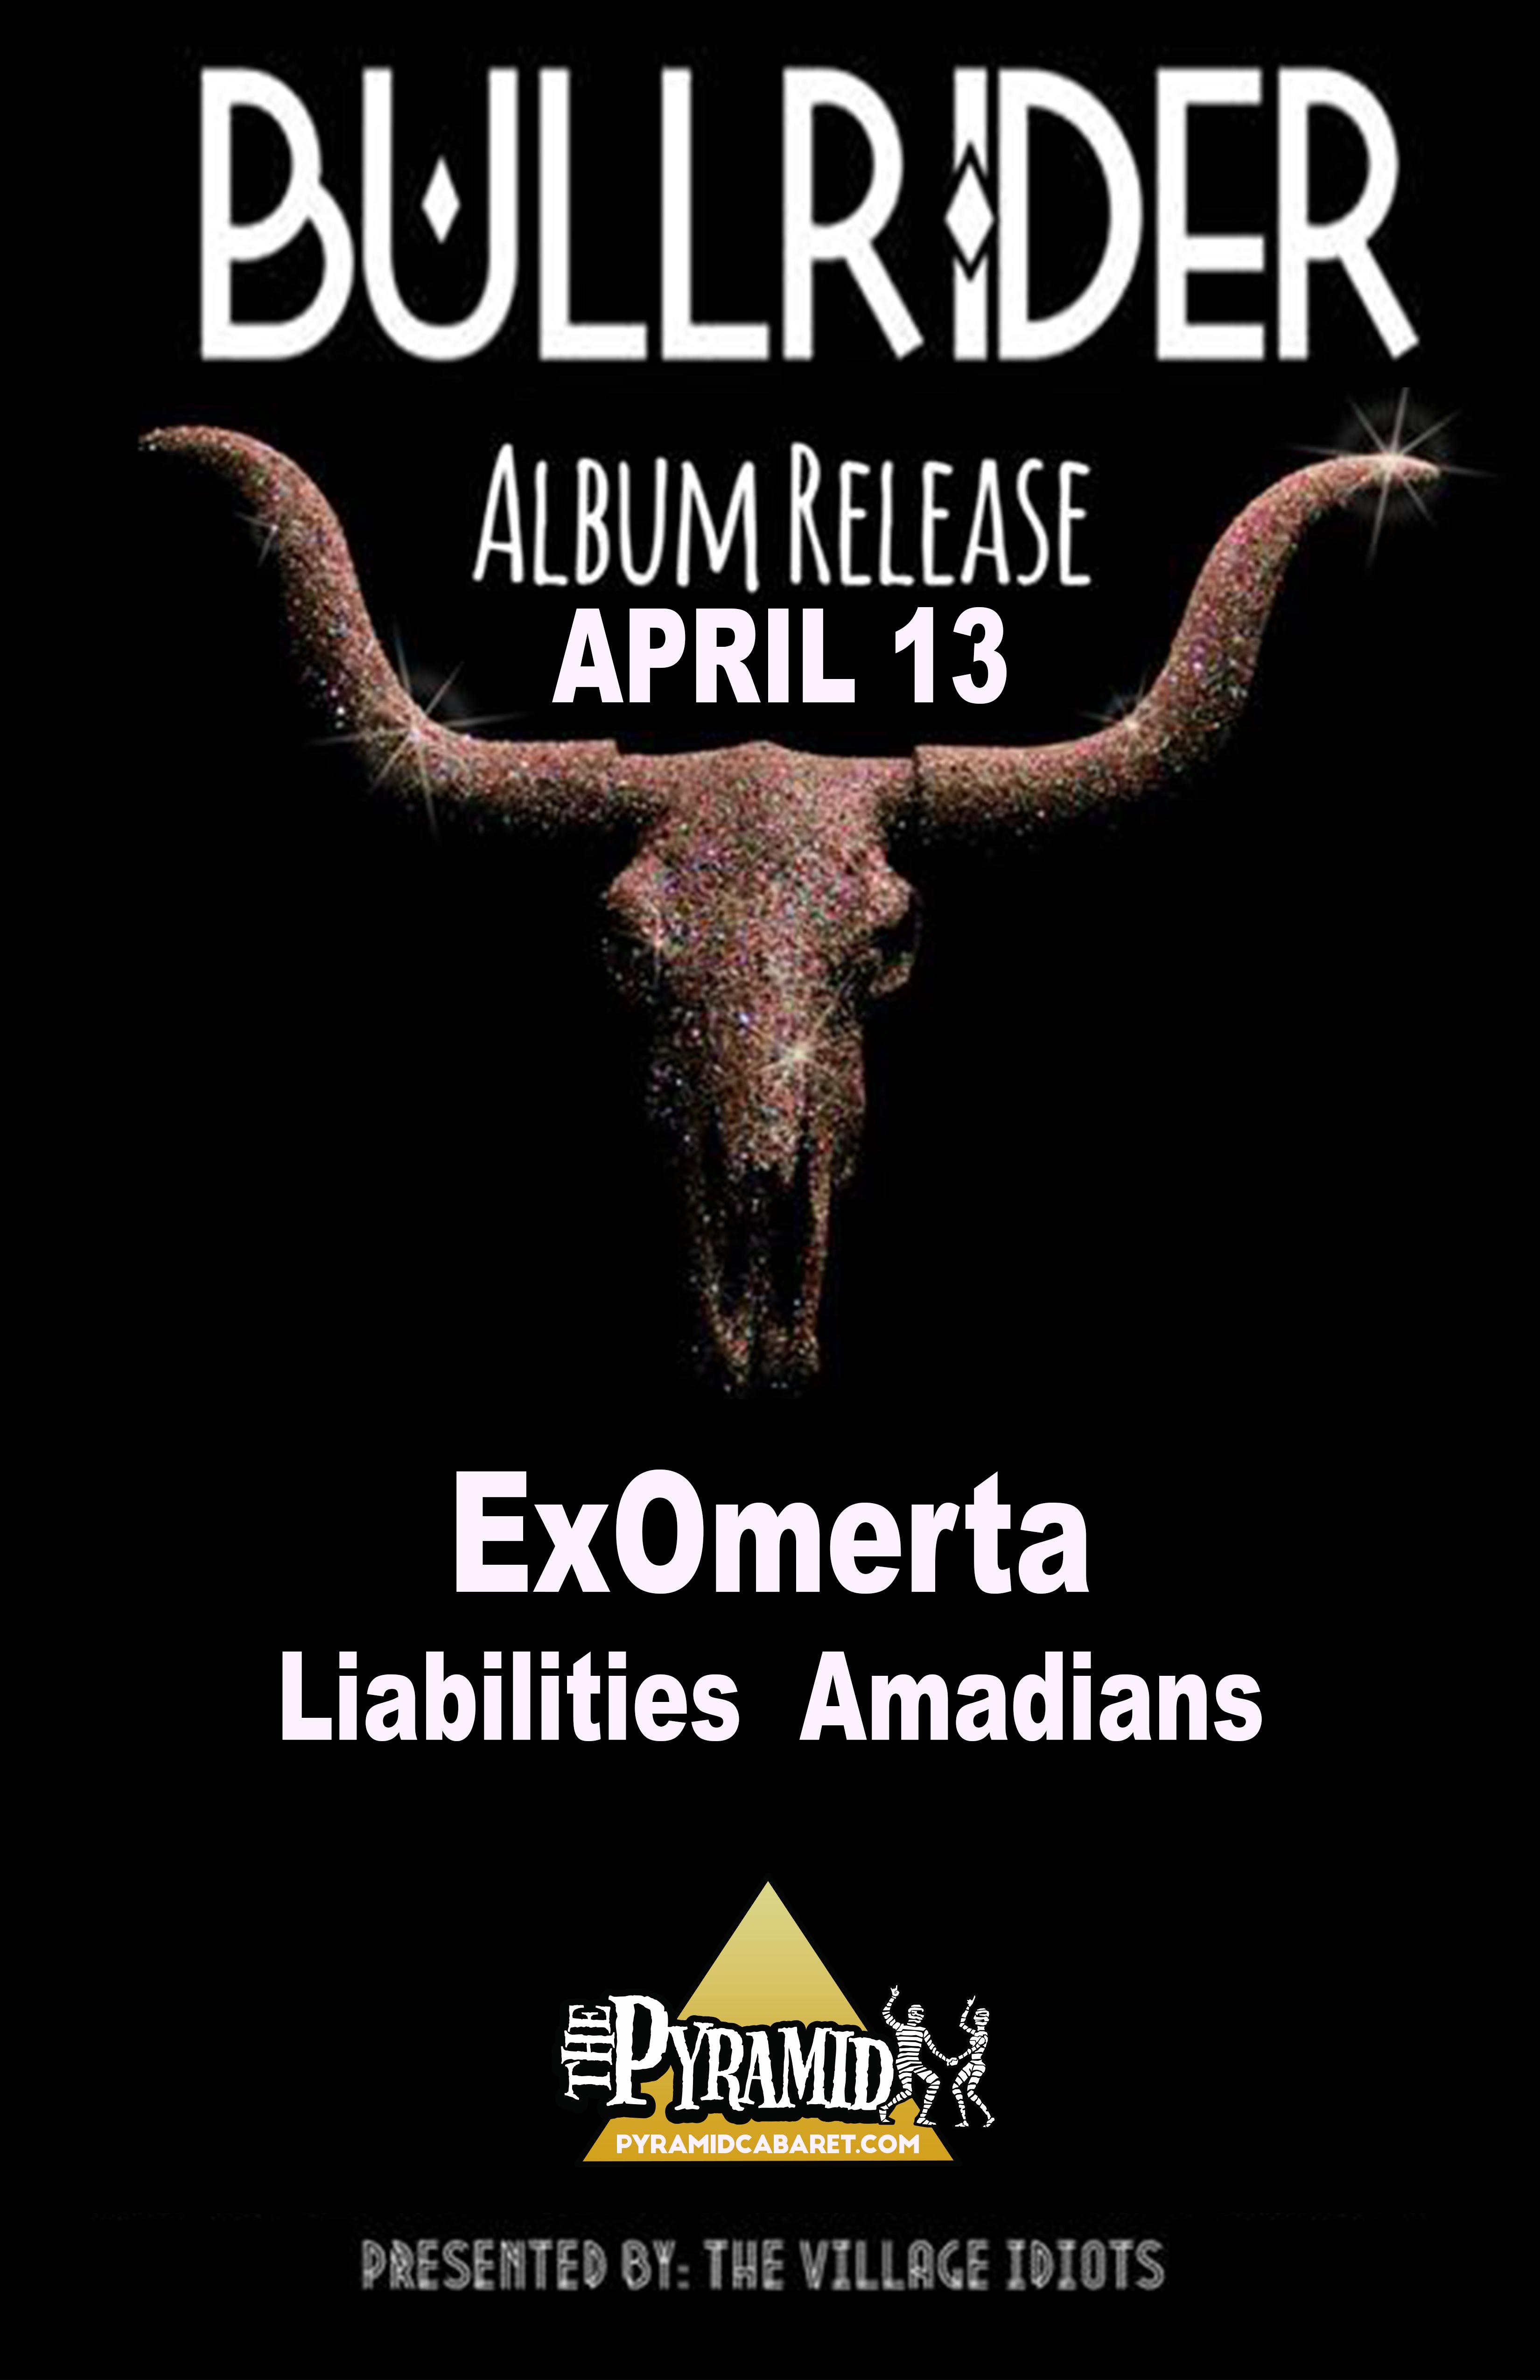 BULLRIDER - APRIL 13 - The PYRAMID 00184